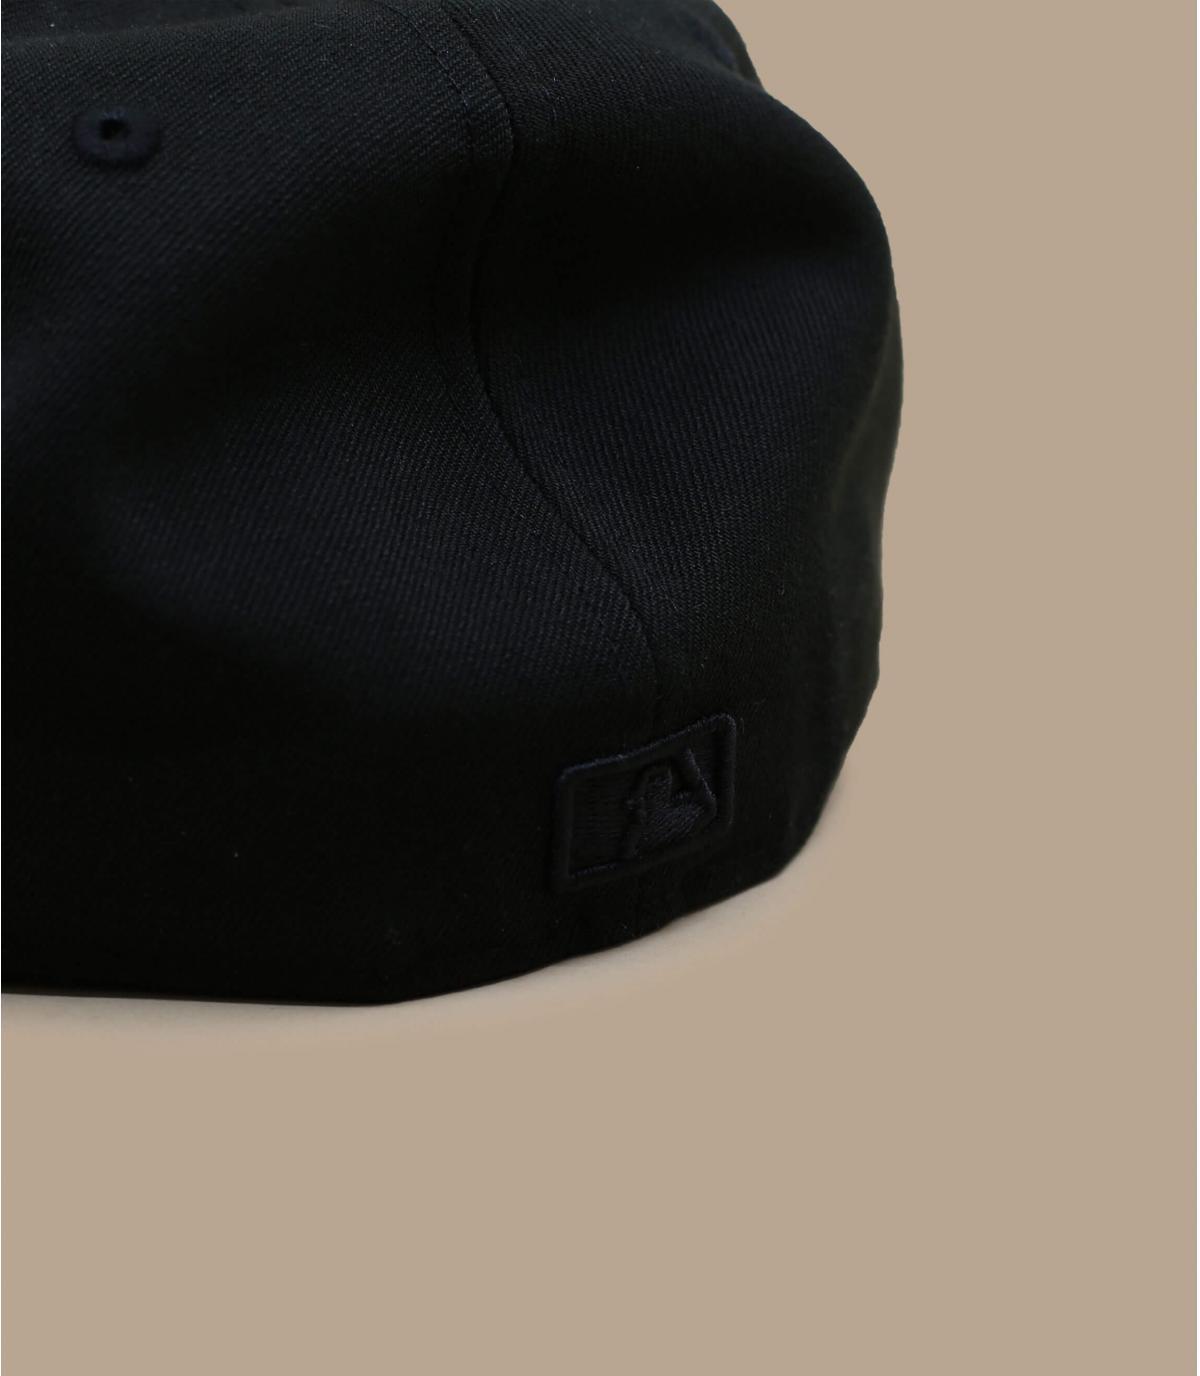 Details MLB Basic NY 59Fifty black black - Abbildung 4